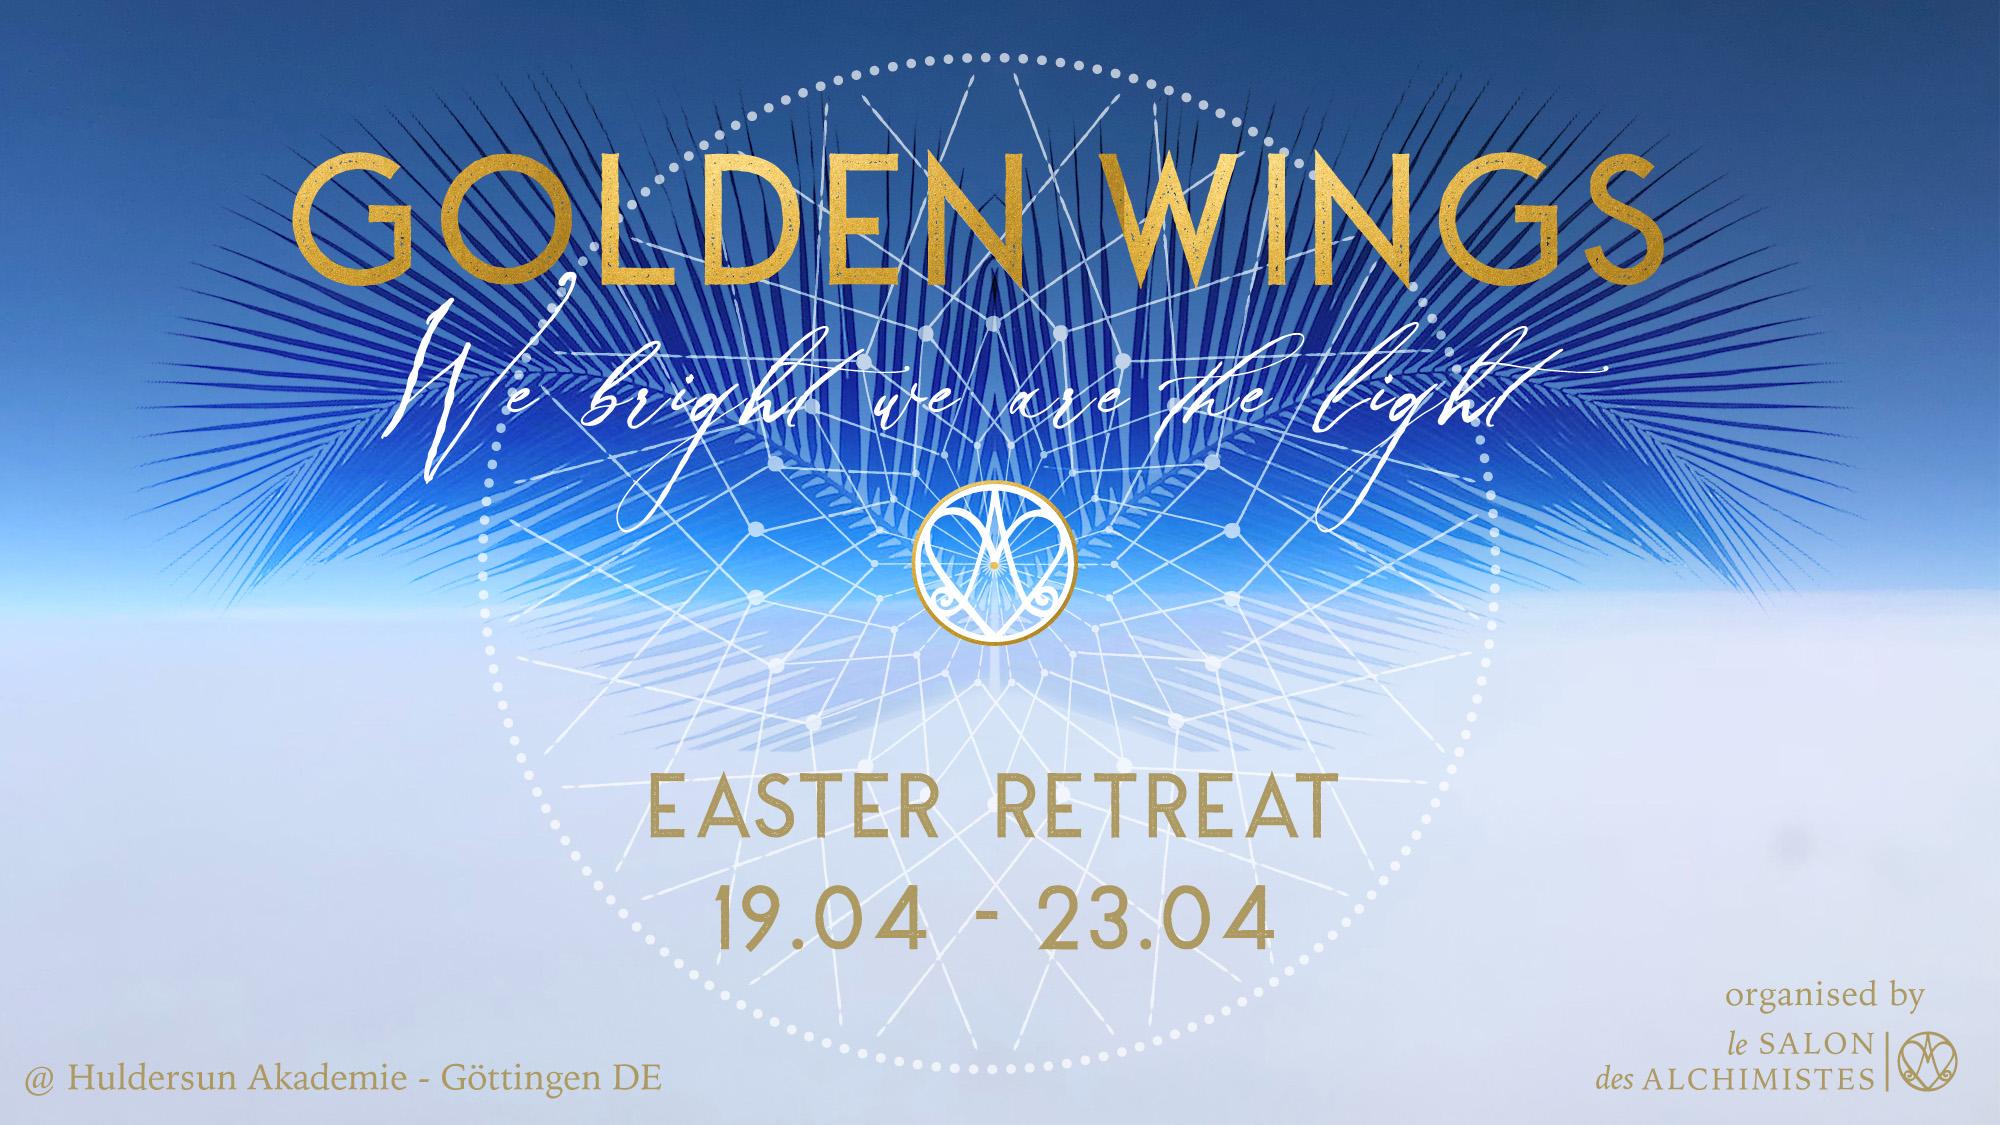 Golden Wings Osterretreat 2019